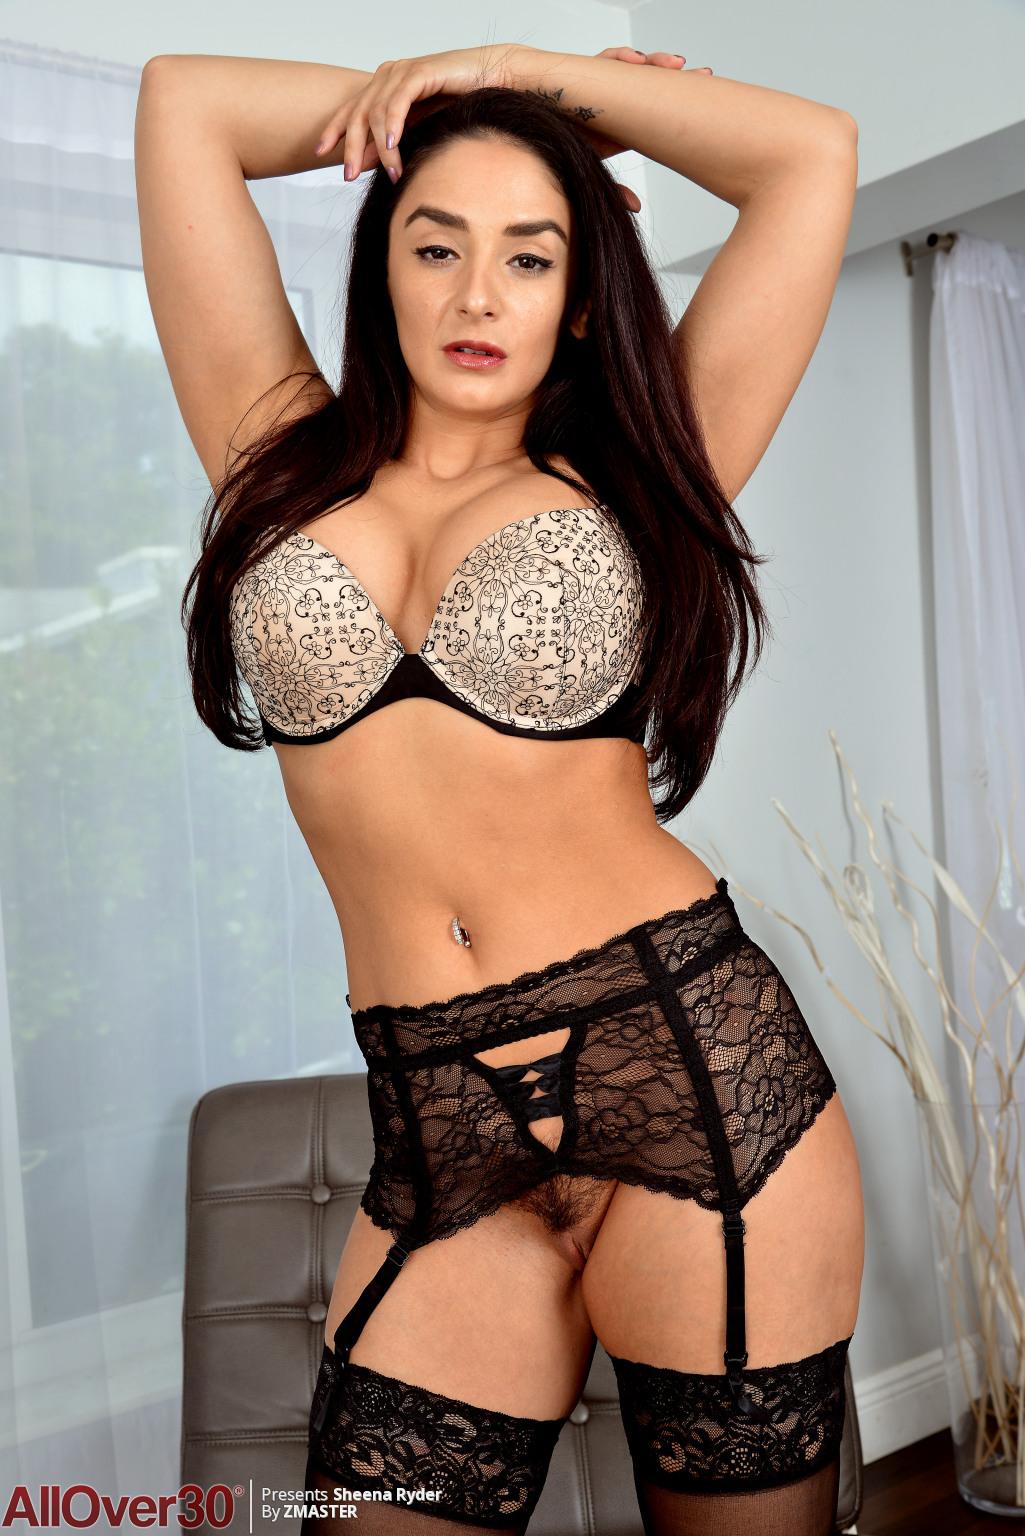 big-tits-beauty-sheena-ryder-02